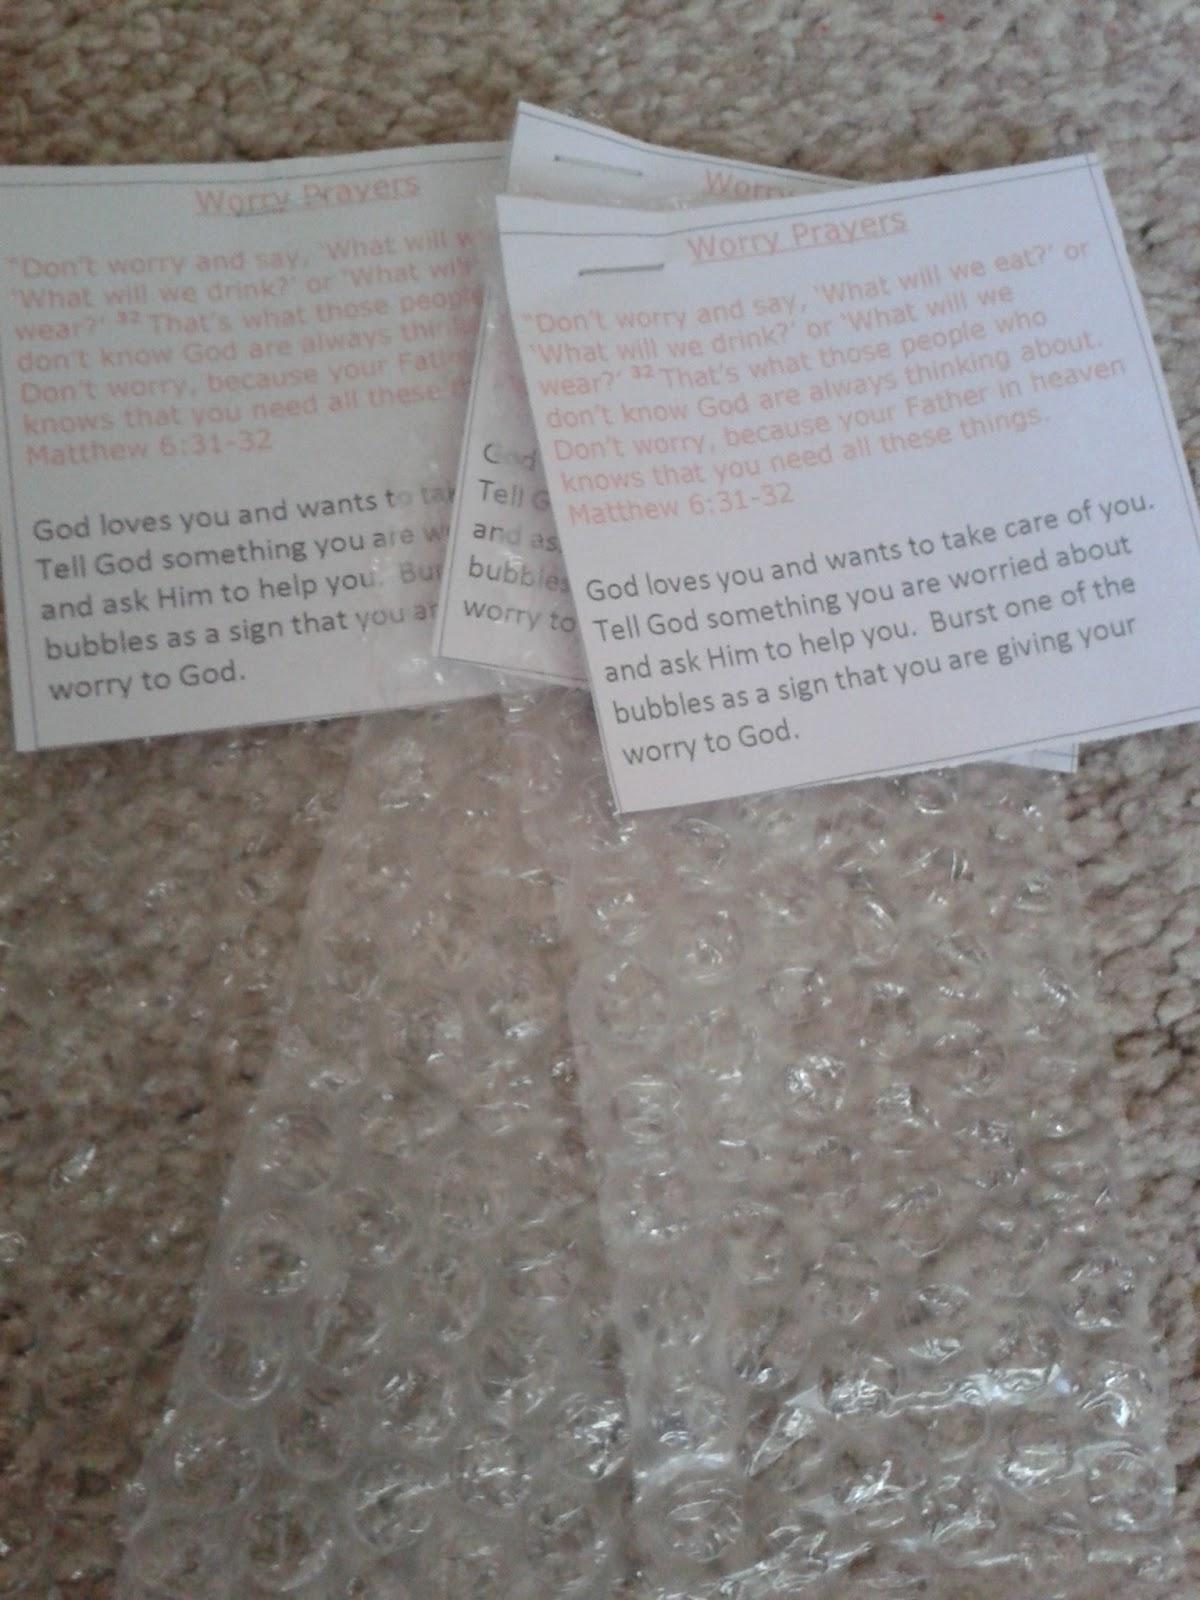 Flame Creative Children 39 S Ministry Bubblewrap Worry Prayers